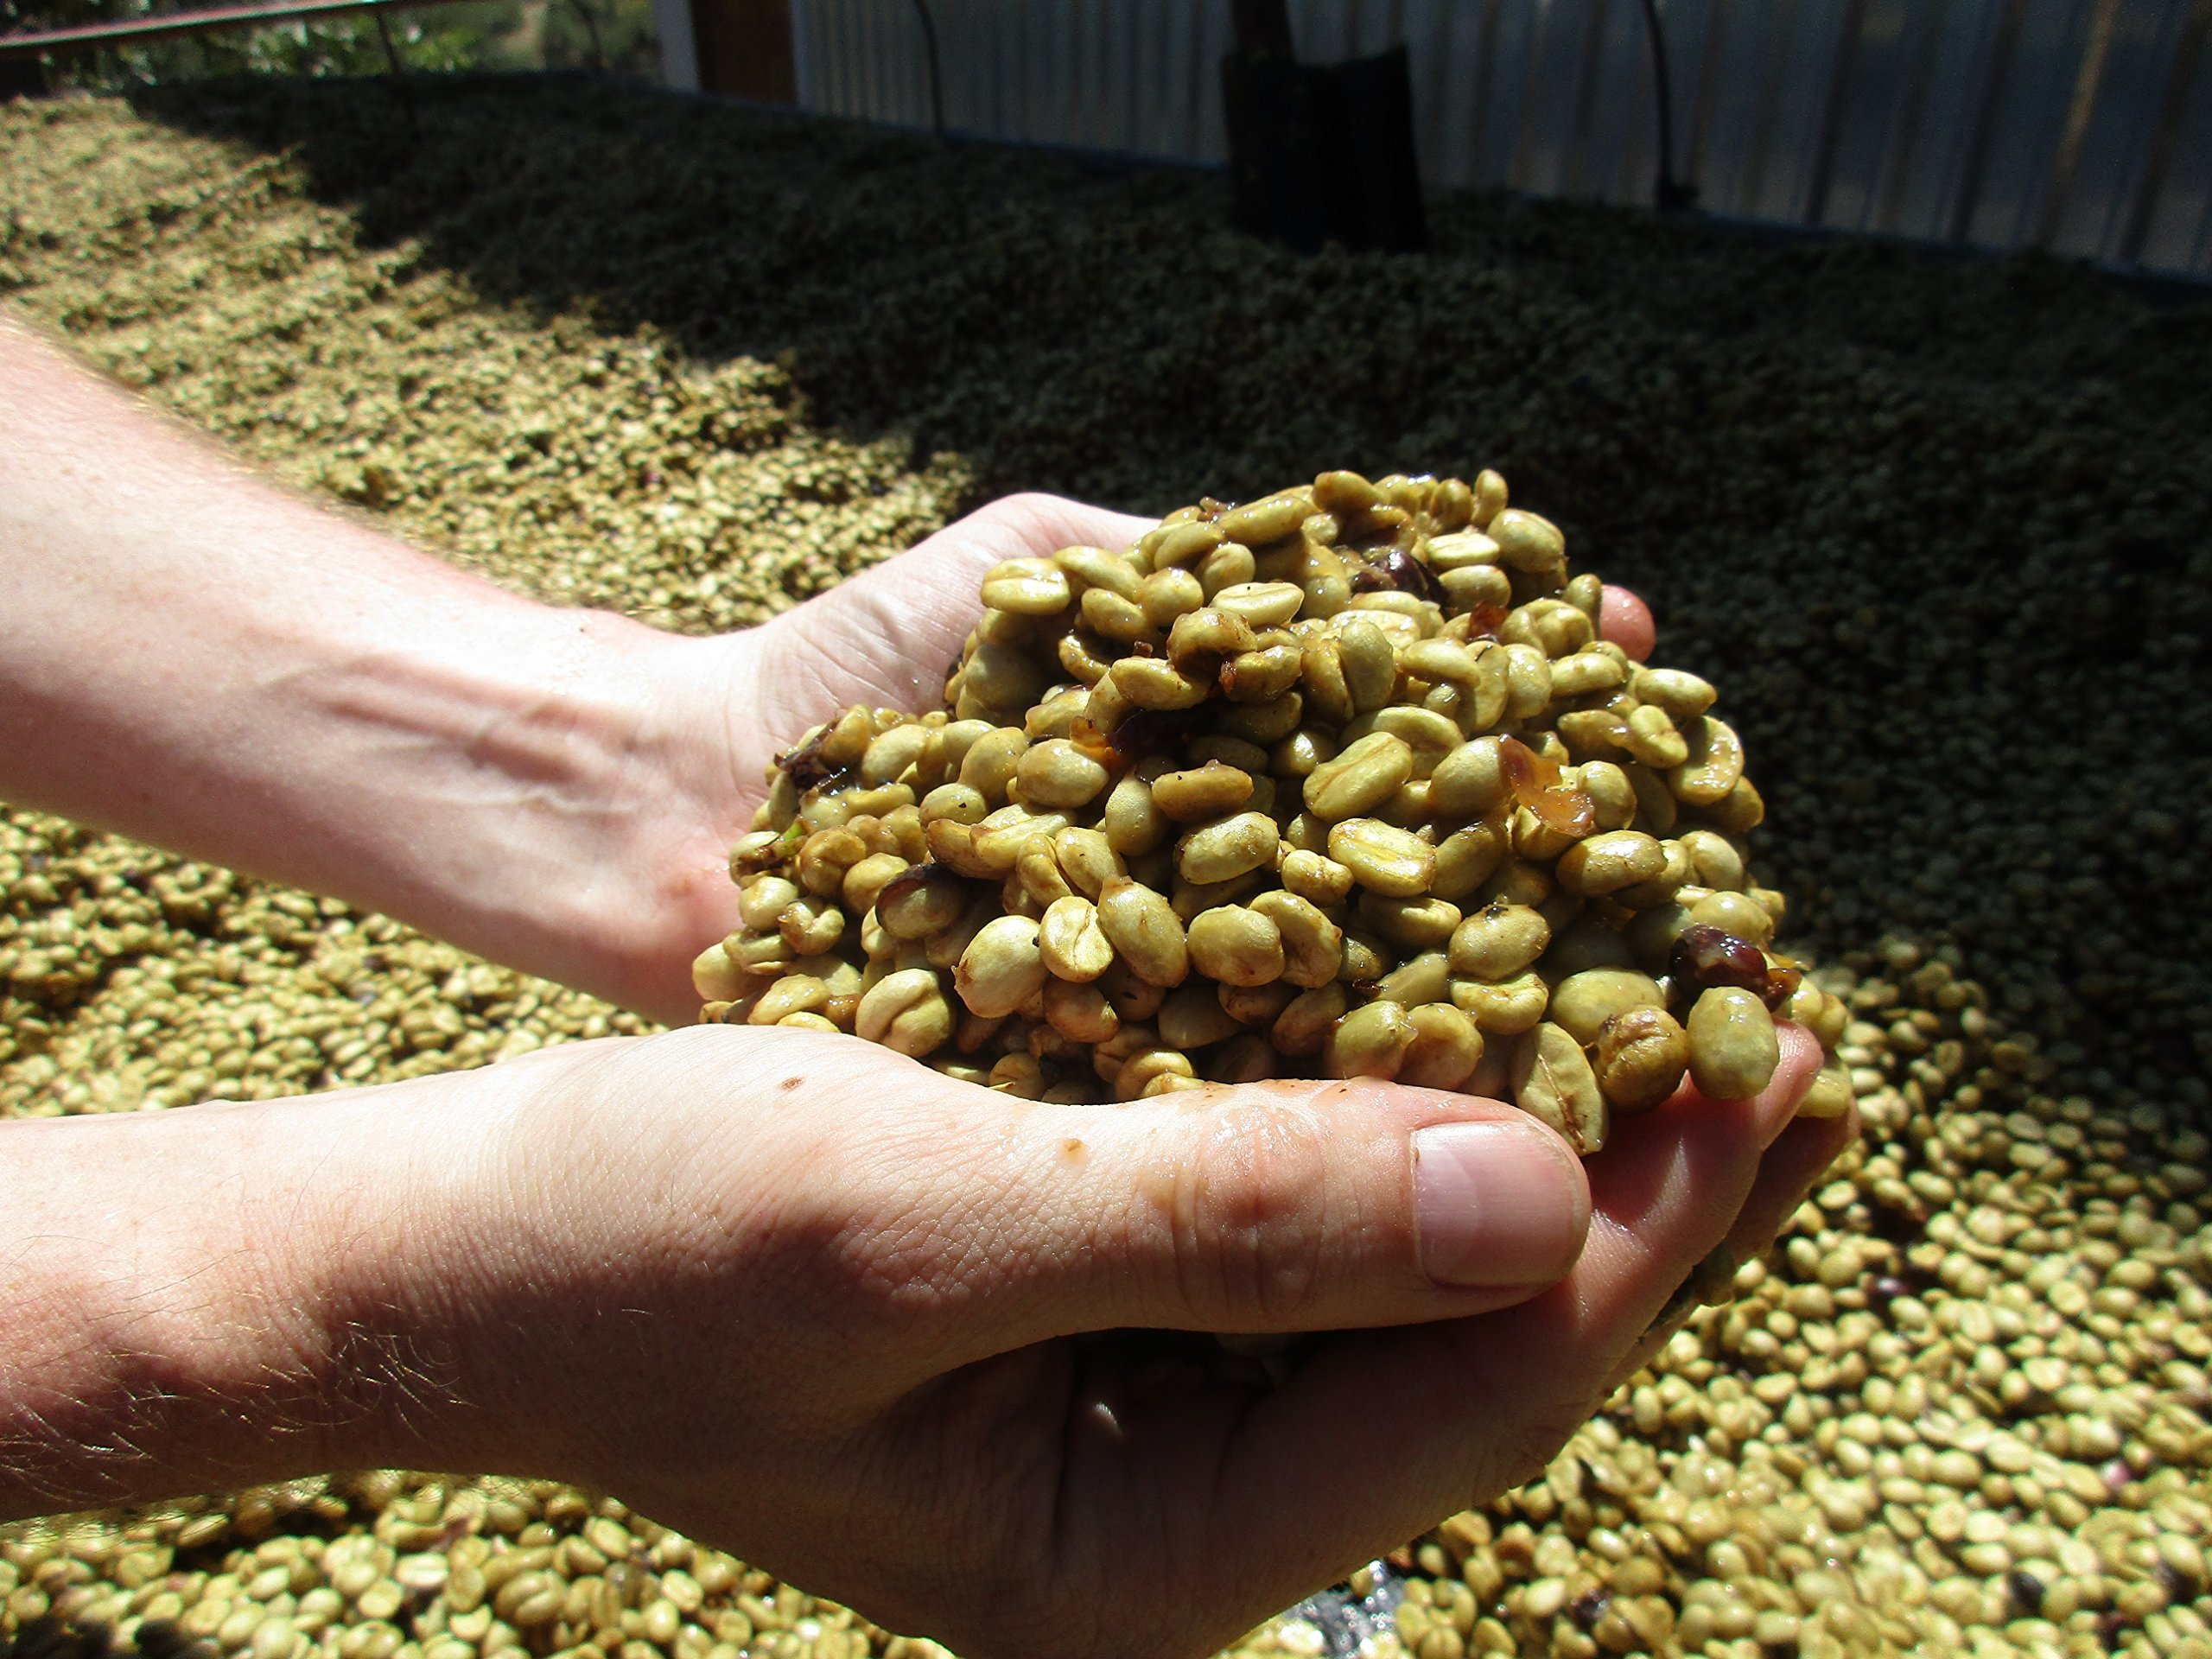 Costa Rica Olman Aguilera Honey (5 LB) Unroasted Green Coffee 100% Specialty Arabica Caffeinated Beans